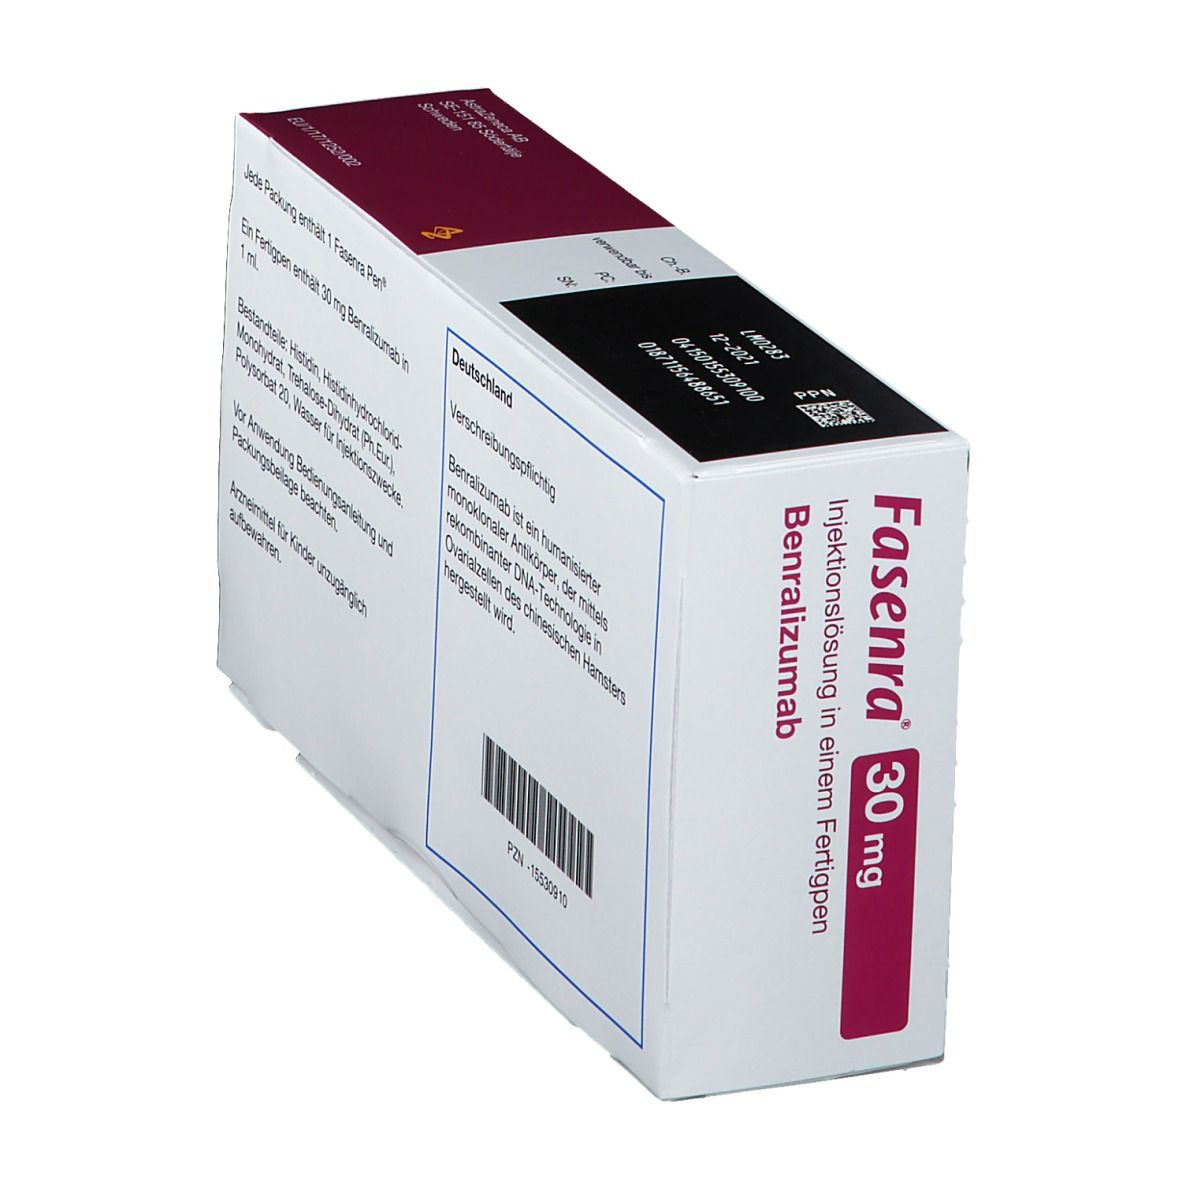 FASENRA 30 mg Injektionslösung in einem Fertigpen